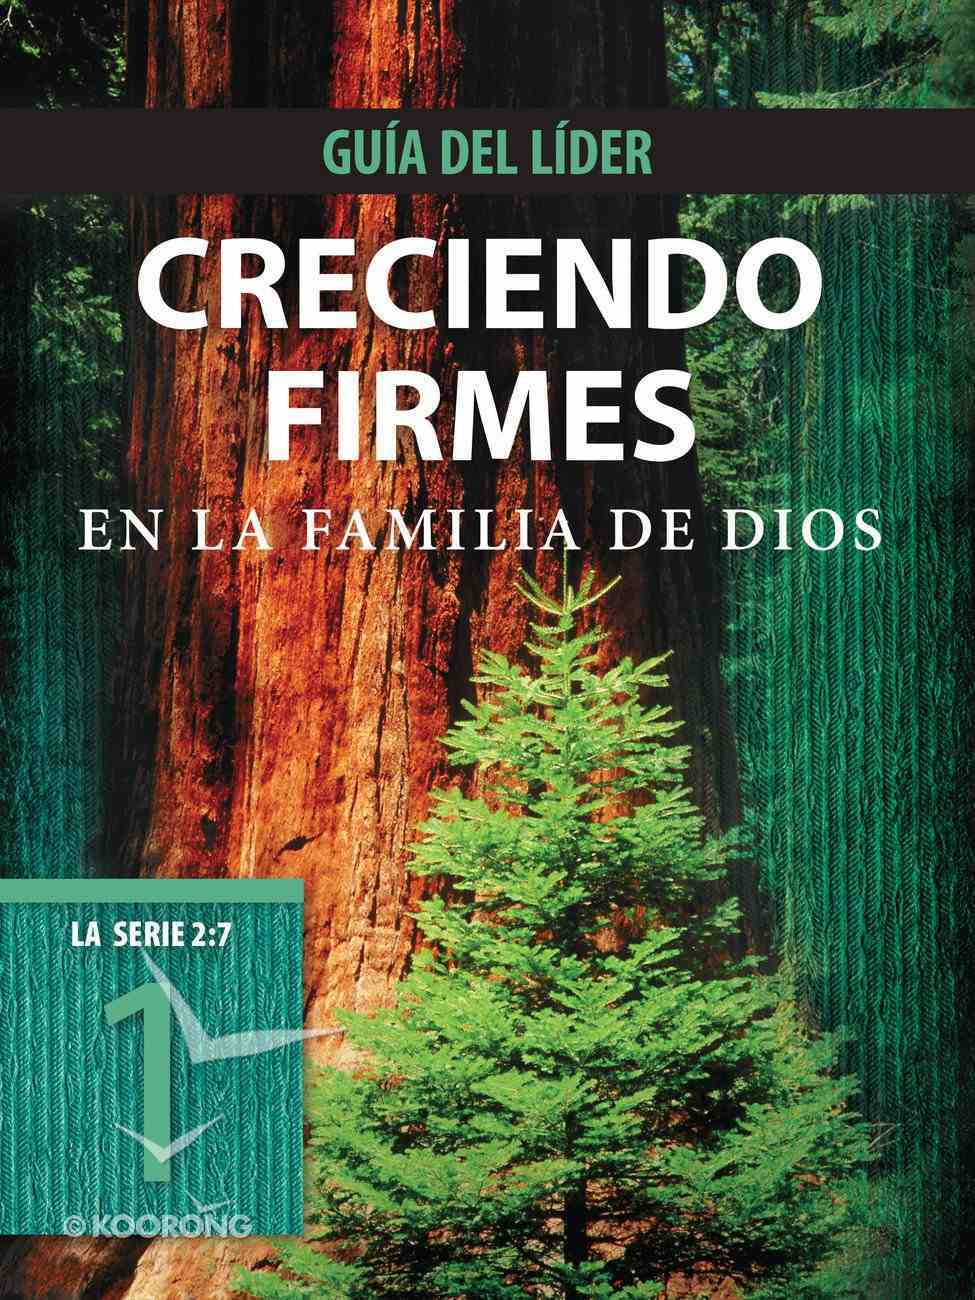 Creciendo Firmes En La Familia De Dios, Gua Del Lder eBook